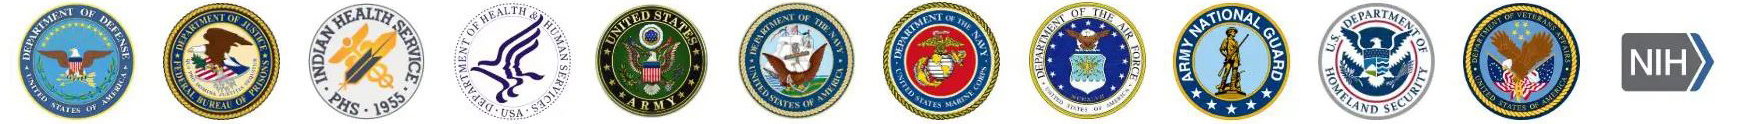 Government Agencies Logos